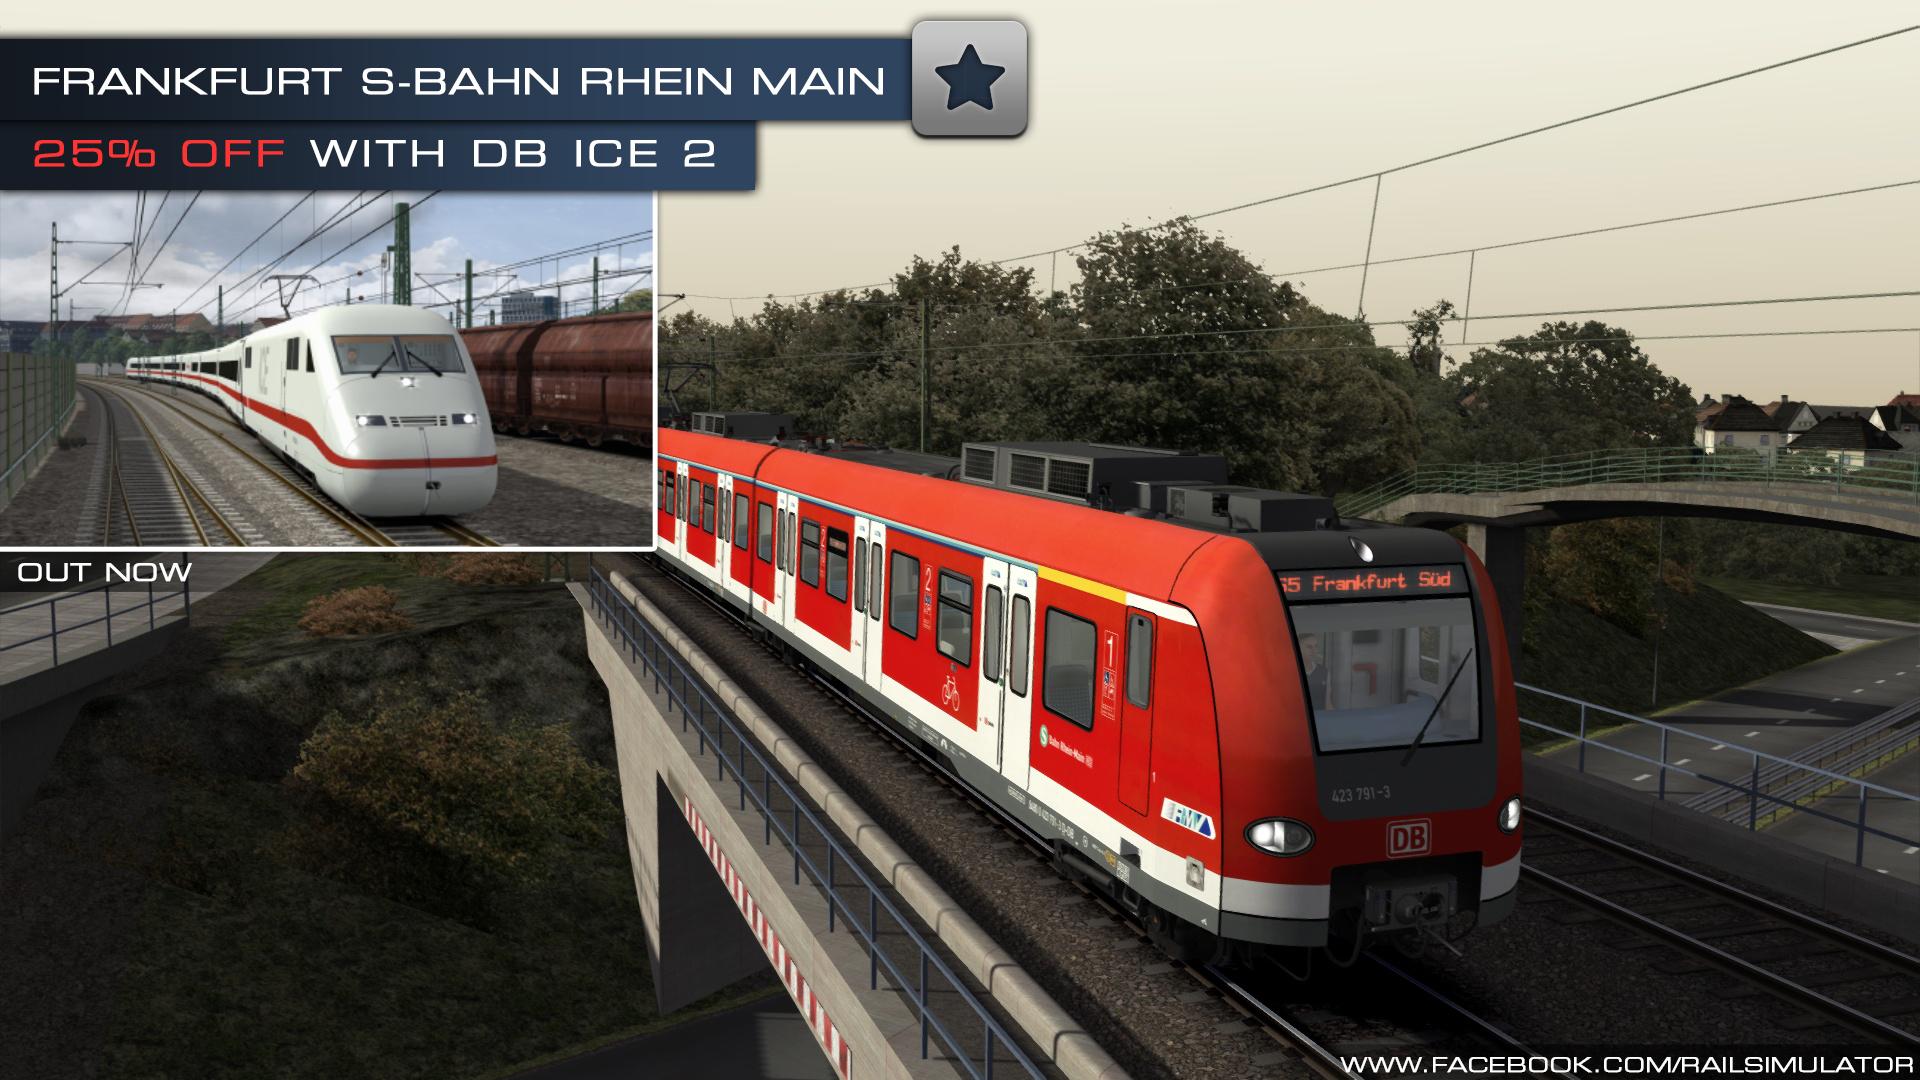 Train Simulator Out Now Frankfurt S Bahn Rhein Main Route Add On